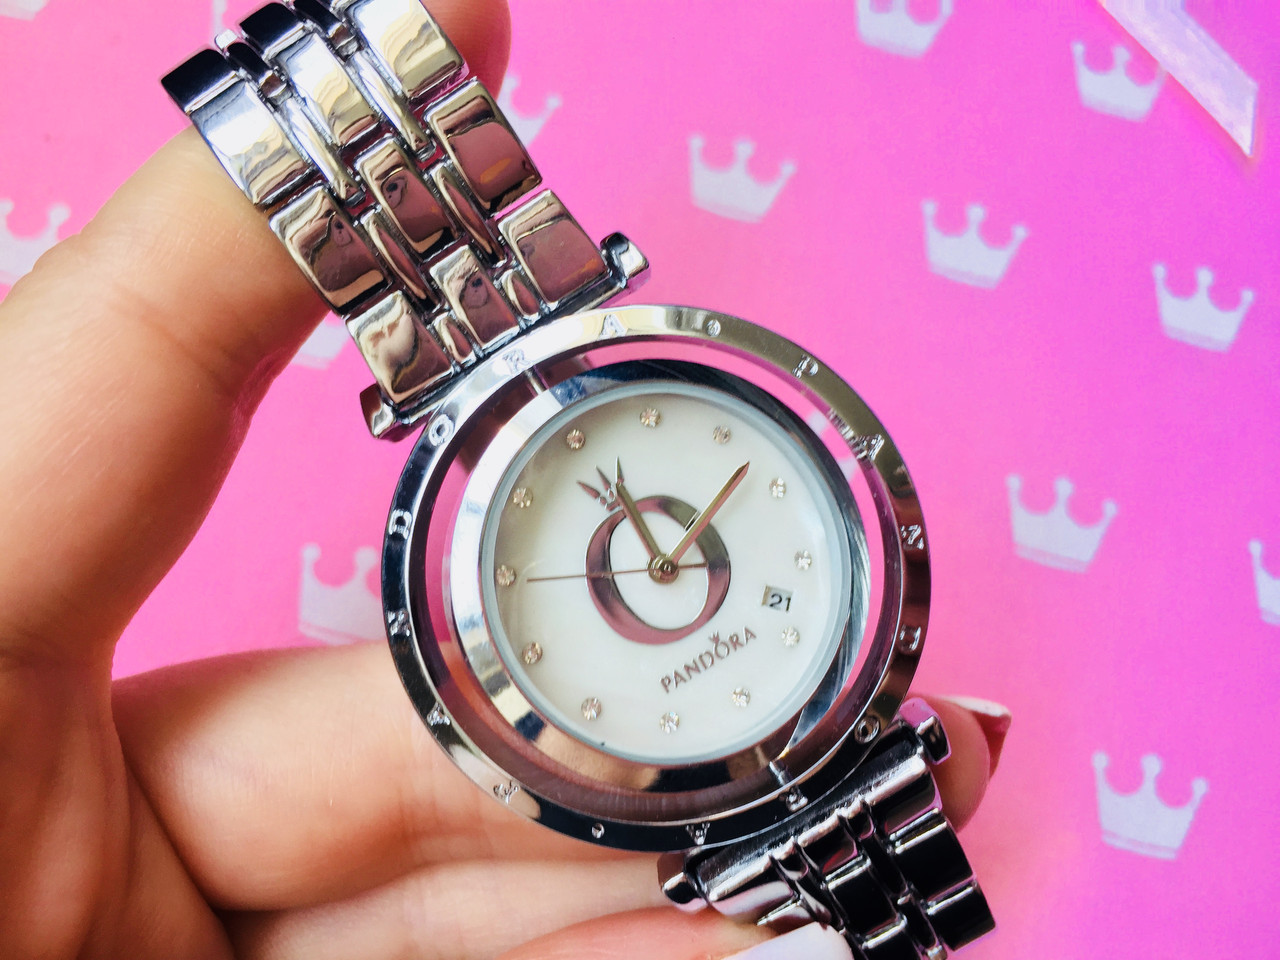 Наручные часы Пандора 409184bn реплика